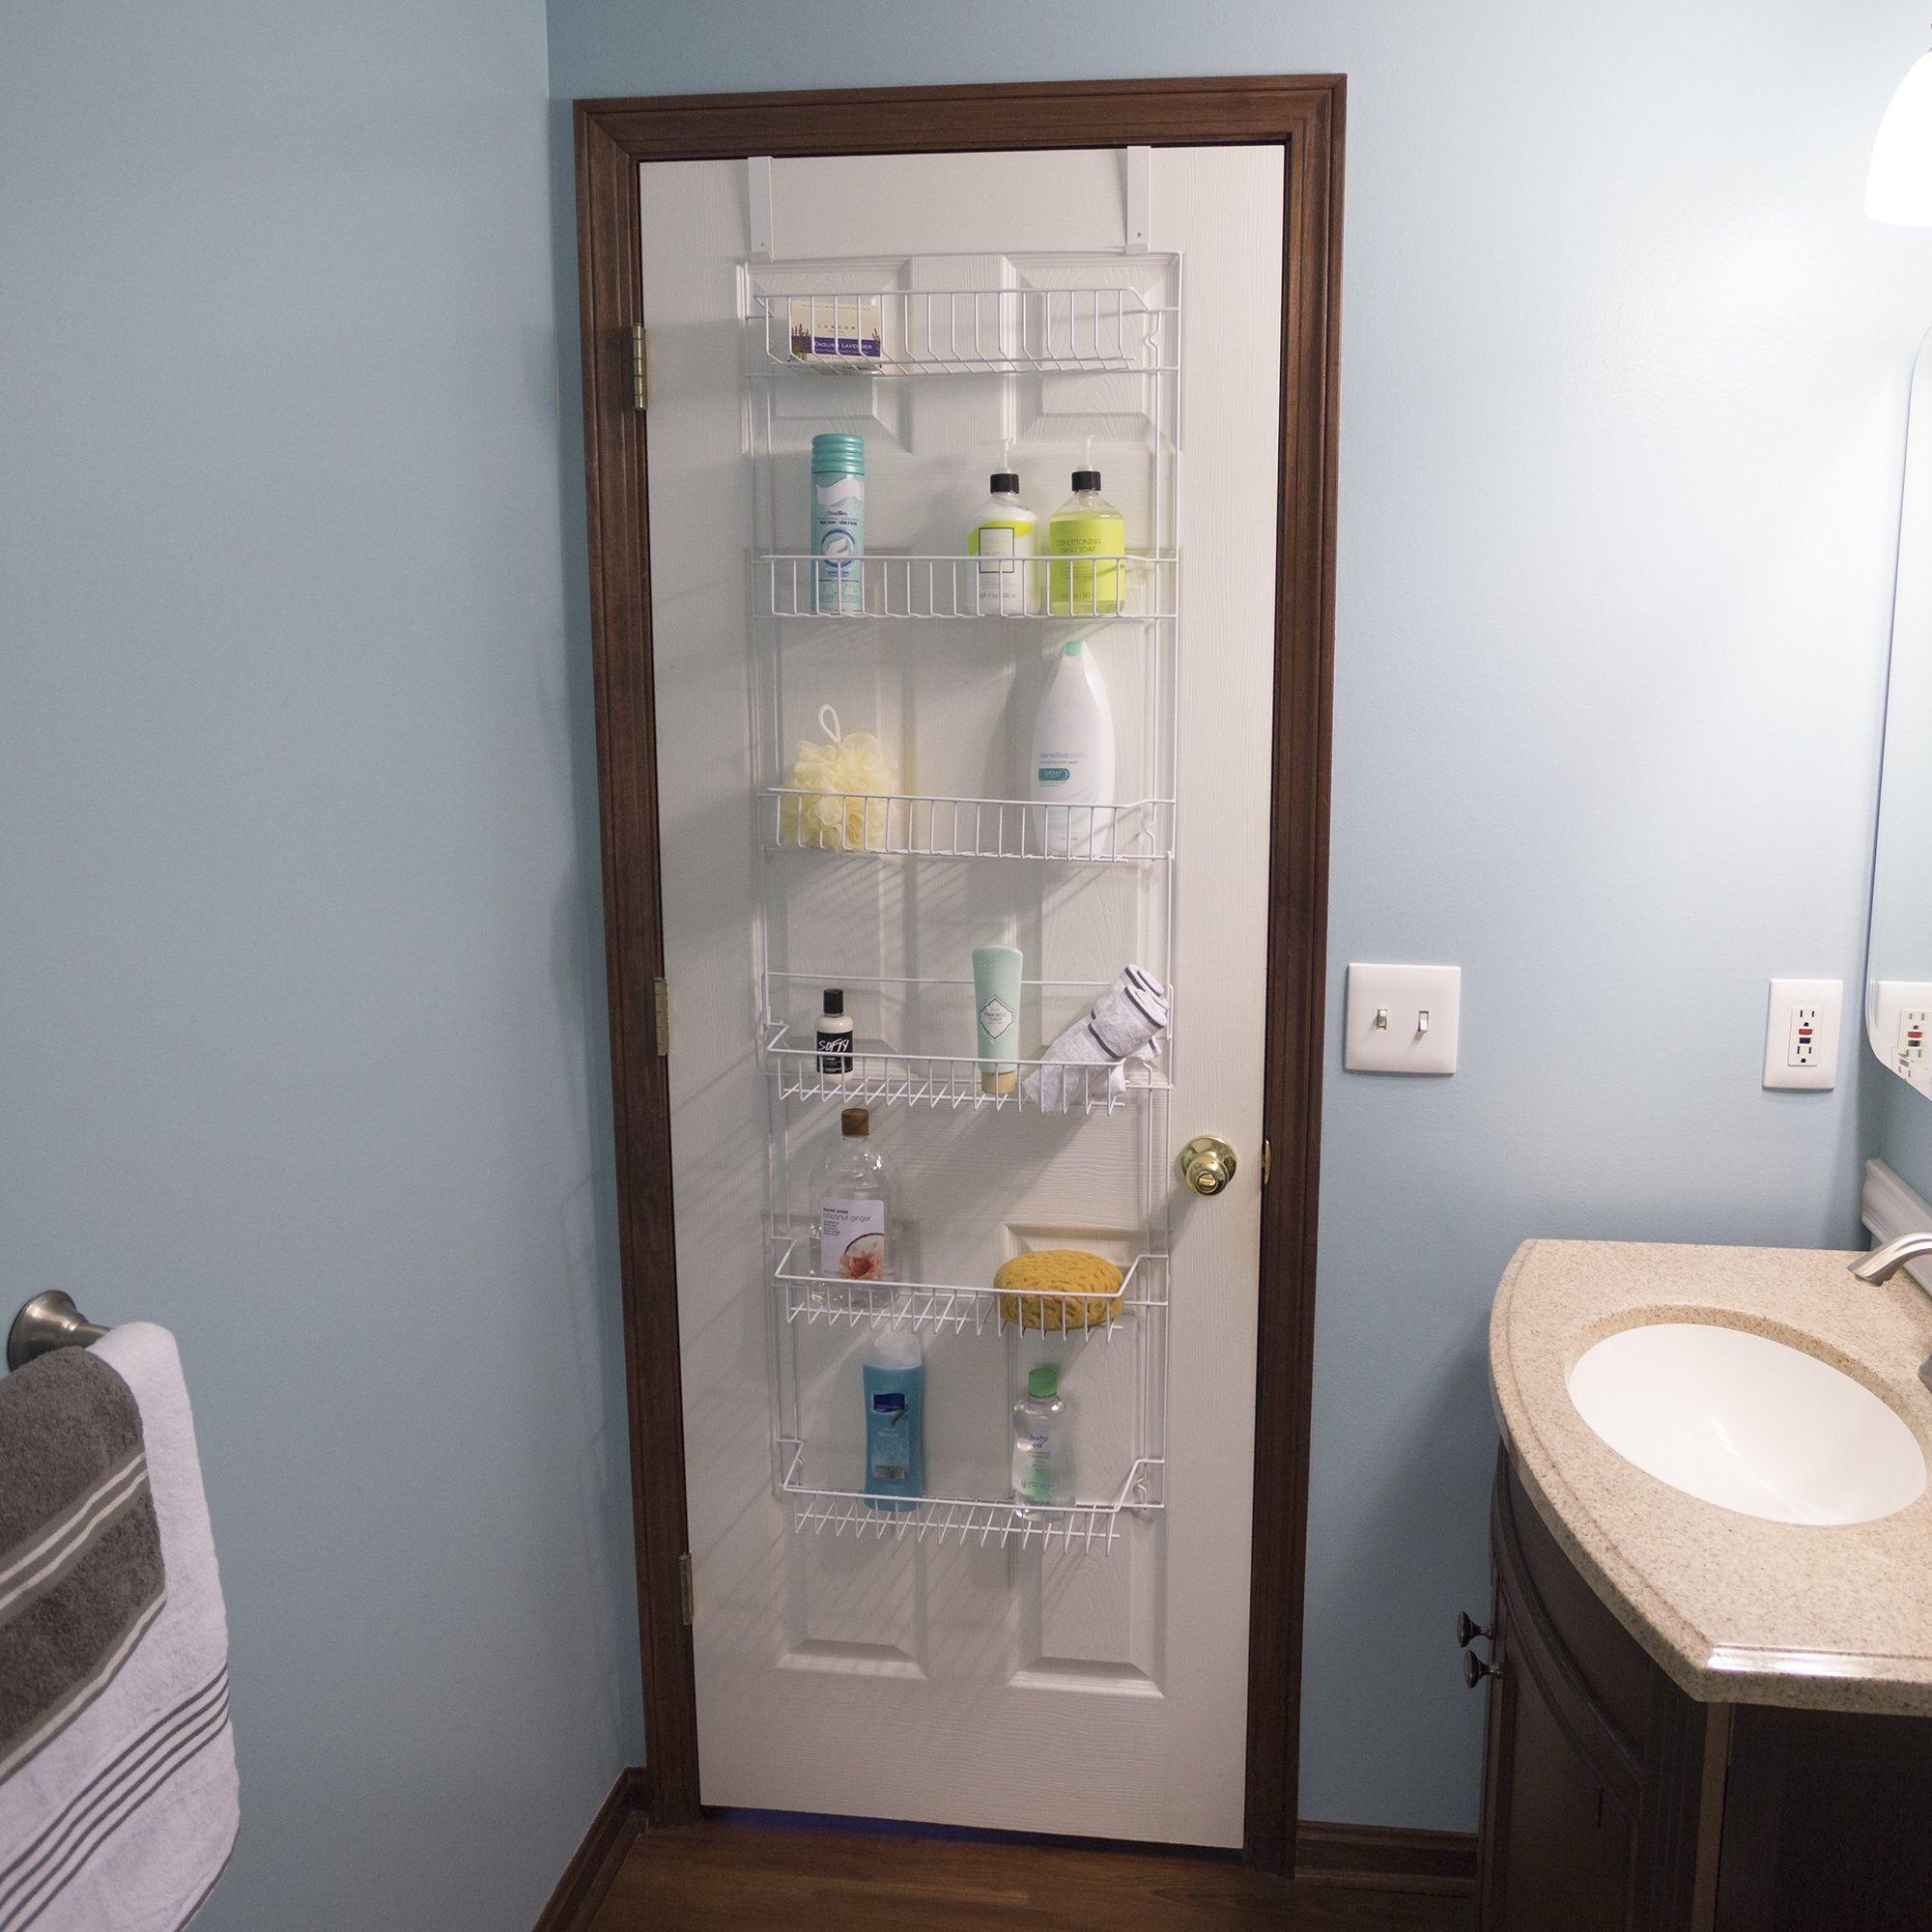 Over The Door Bathroom Organizer With 6 Shelves By Lavish Home Walmart Com In 2020 Bathroom Organisation Small Bathroom Decor First Apartment Decorating